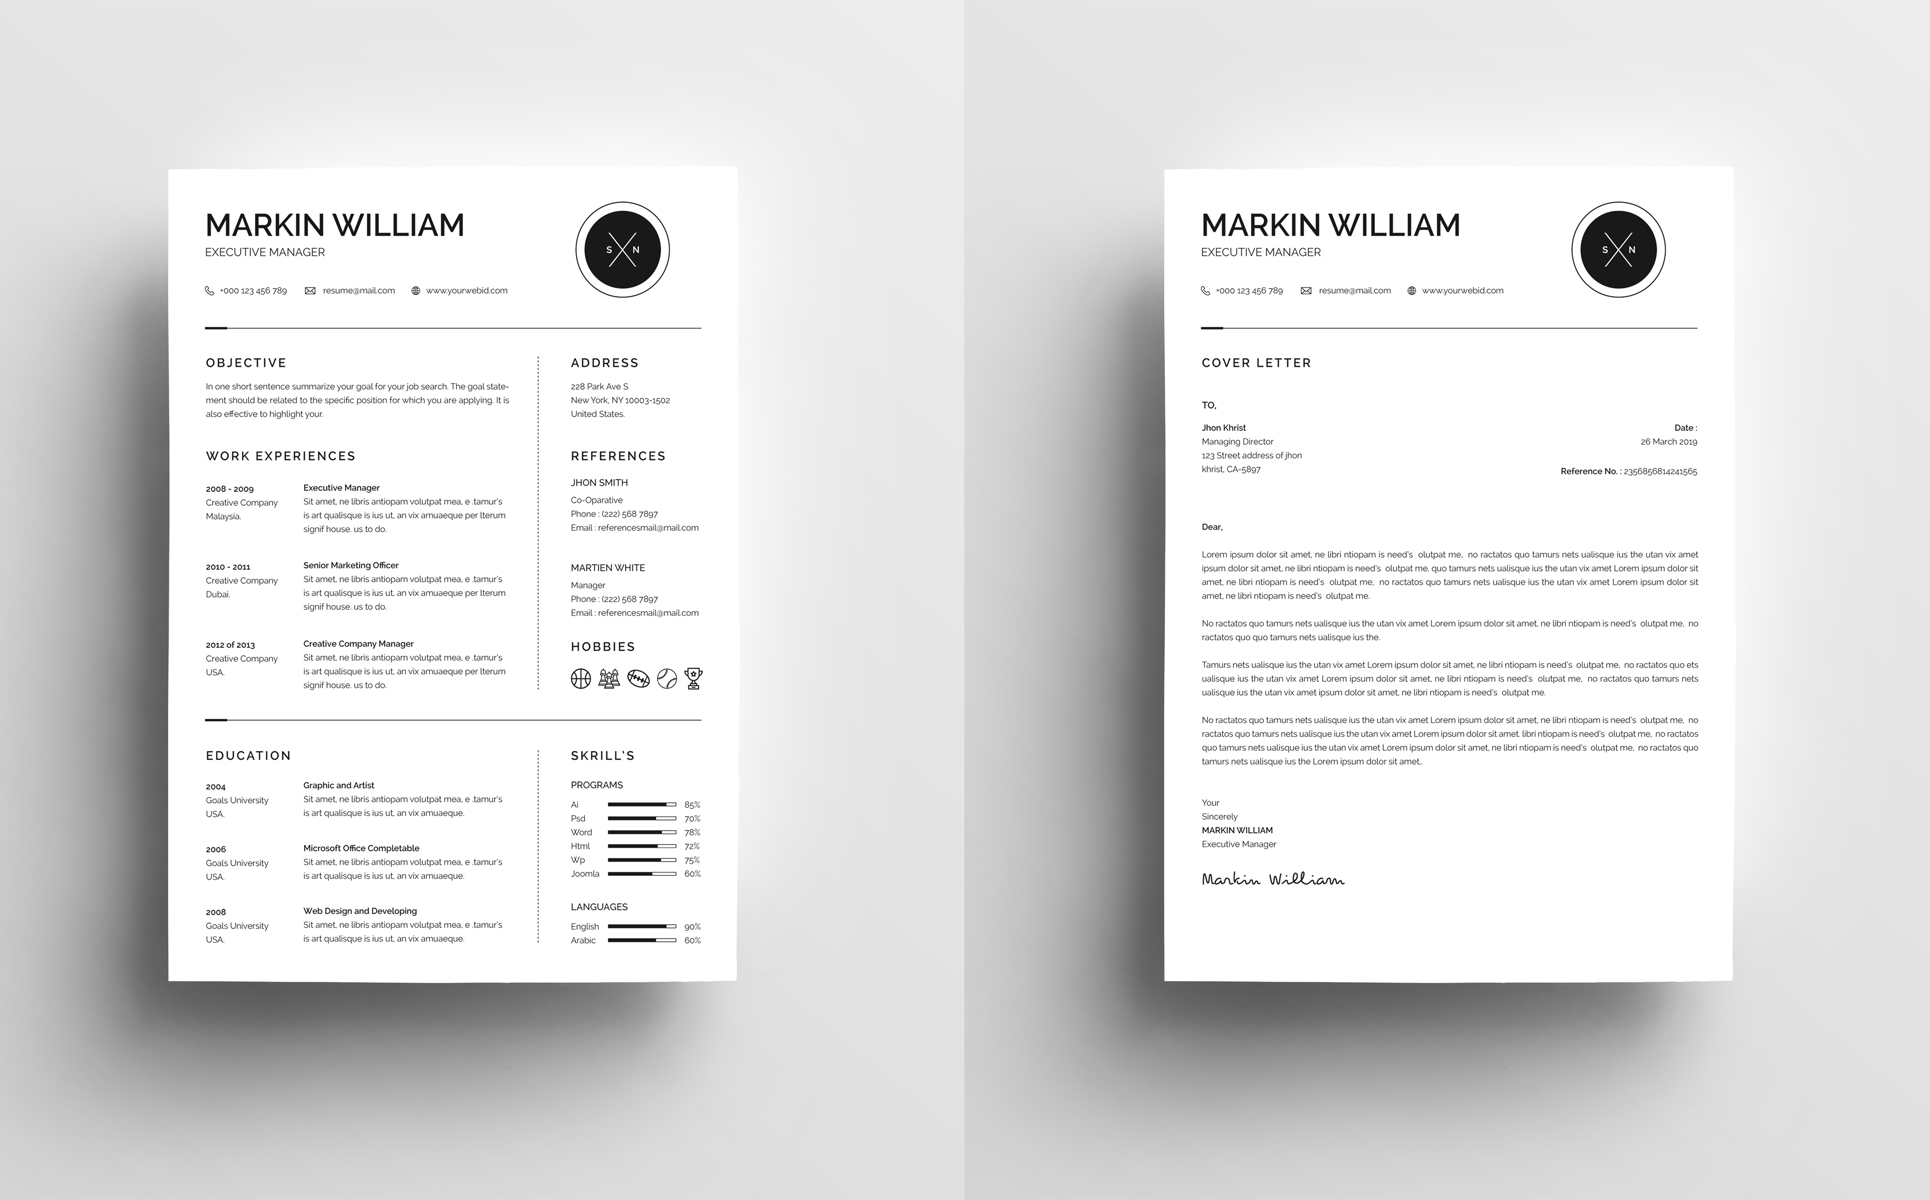 markin william minimal resume template #67728